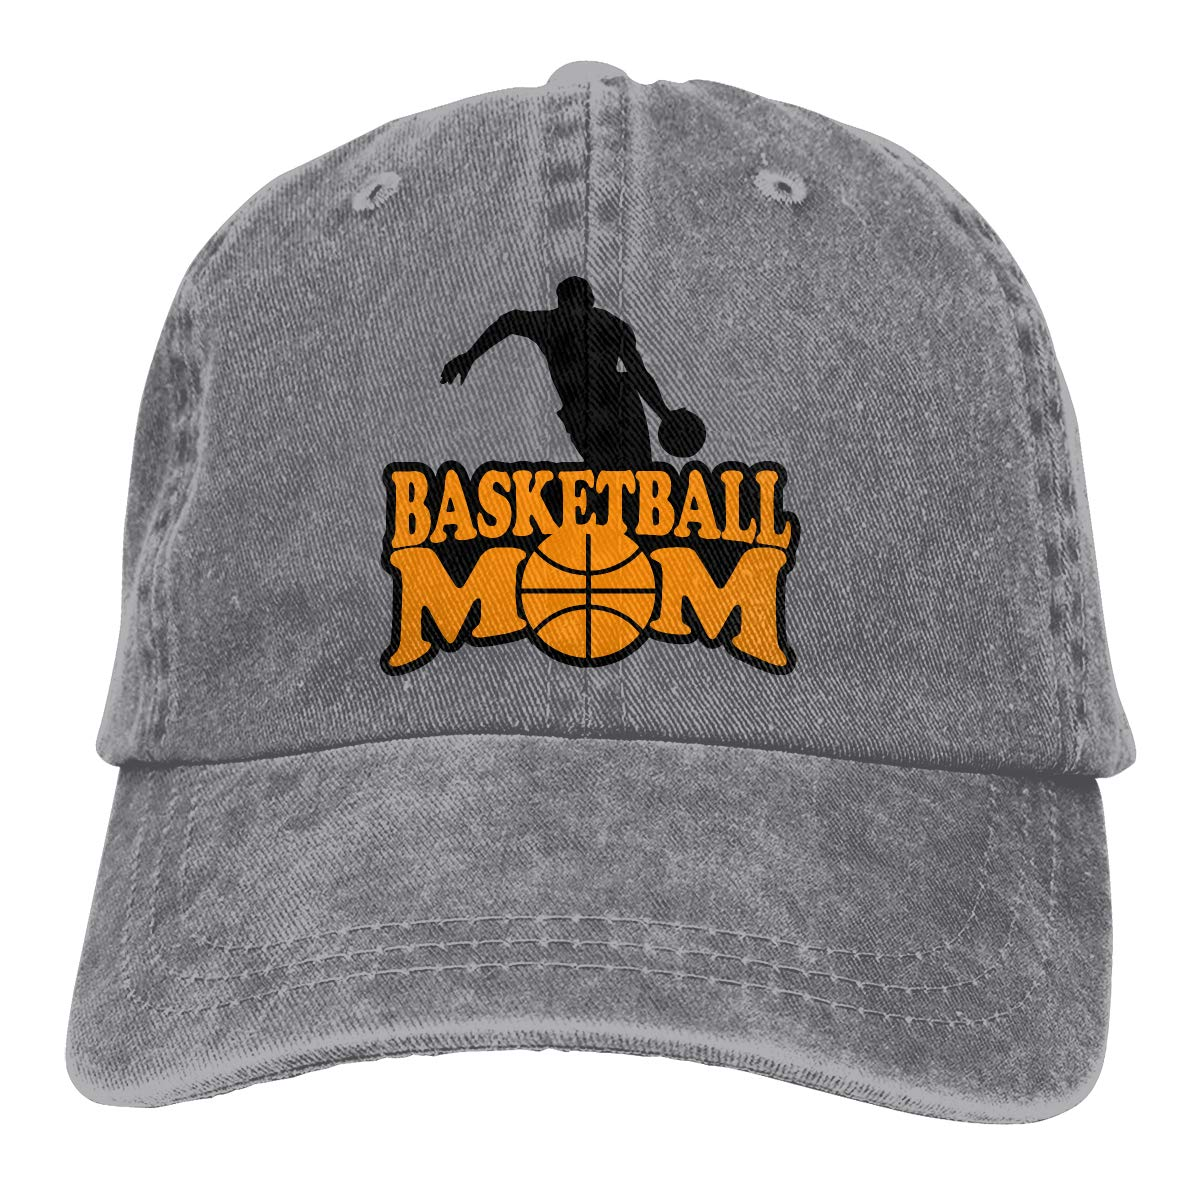 PMGM-C Basketball Mom Unisex Personalize Cowboy Hat Casquette Adjustable Baseball Cap